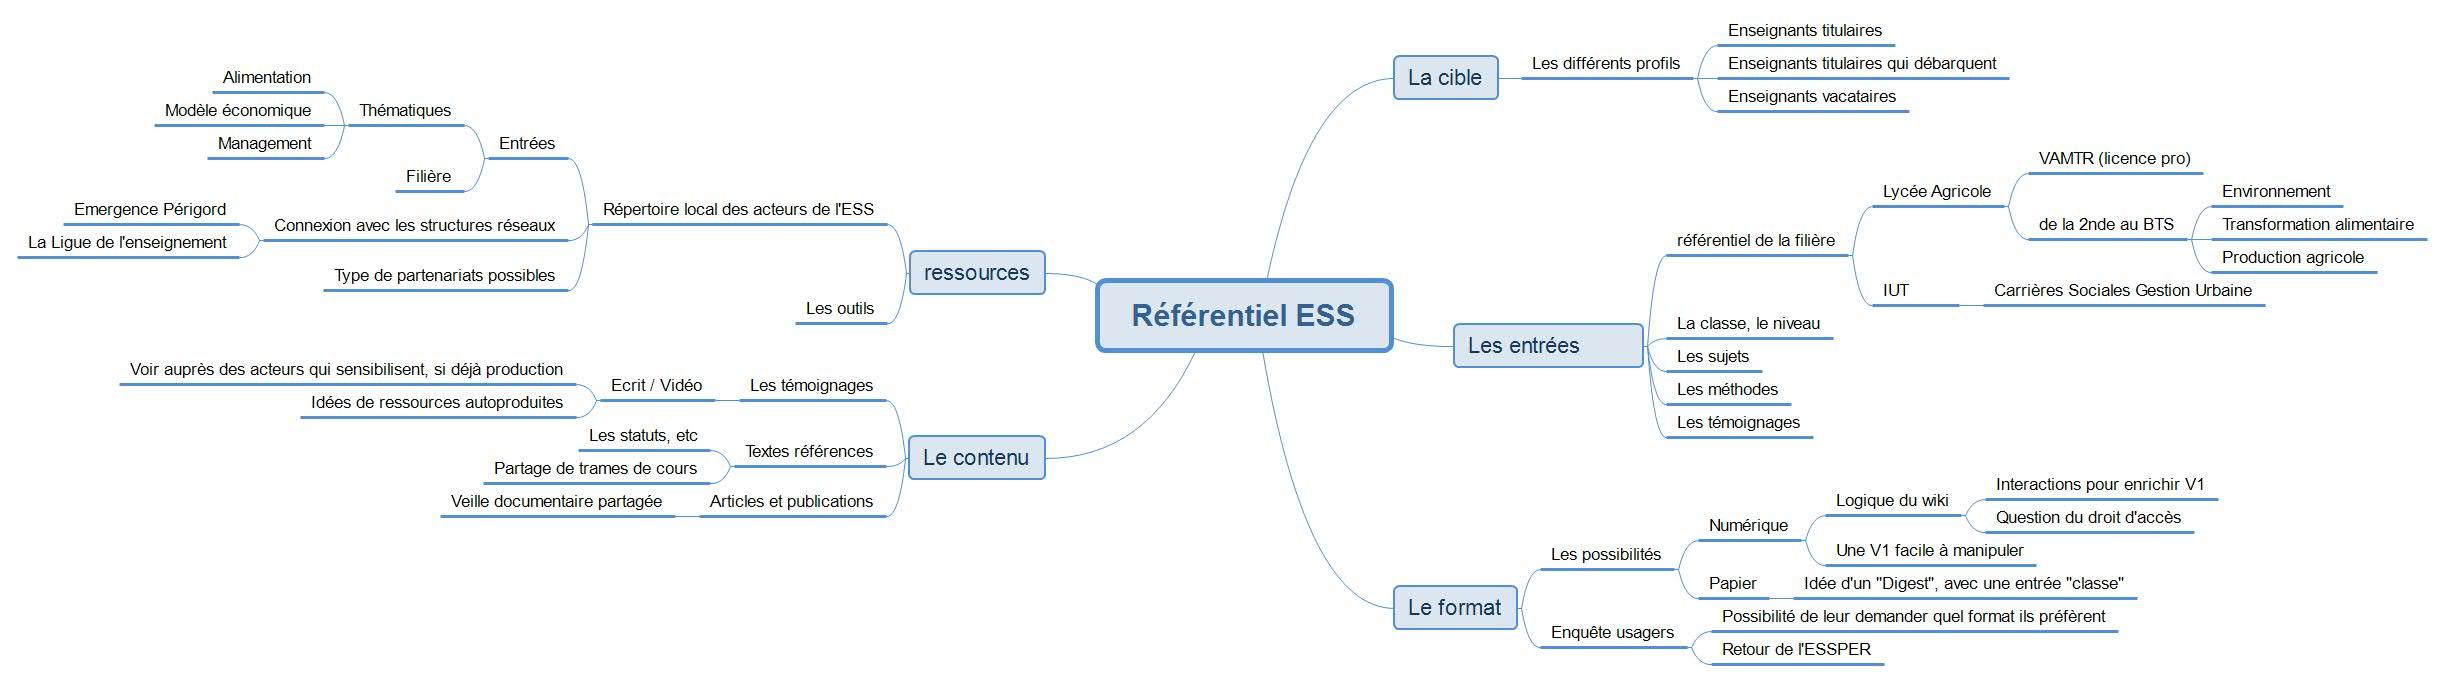 image Rfrentiel_ESS.jpg (0.2MB)